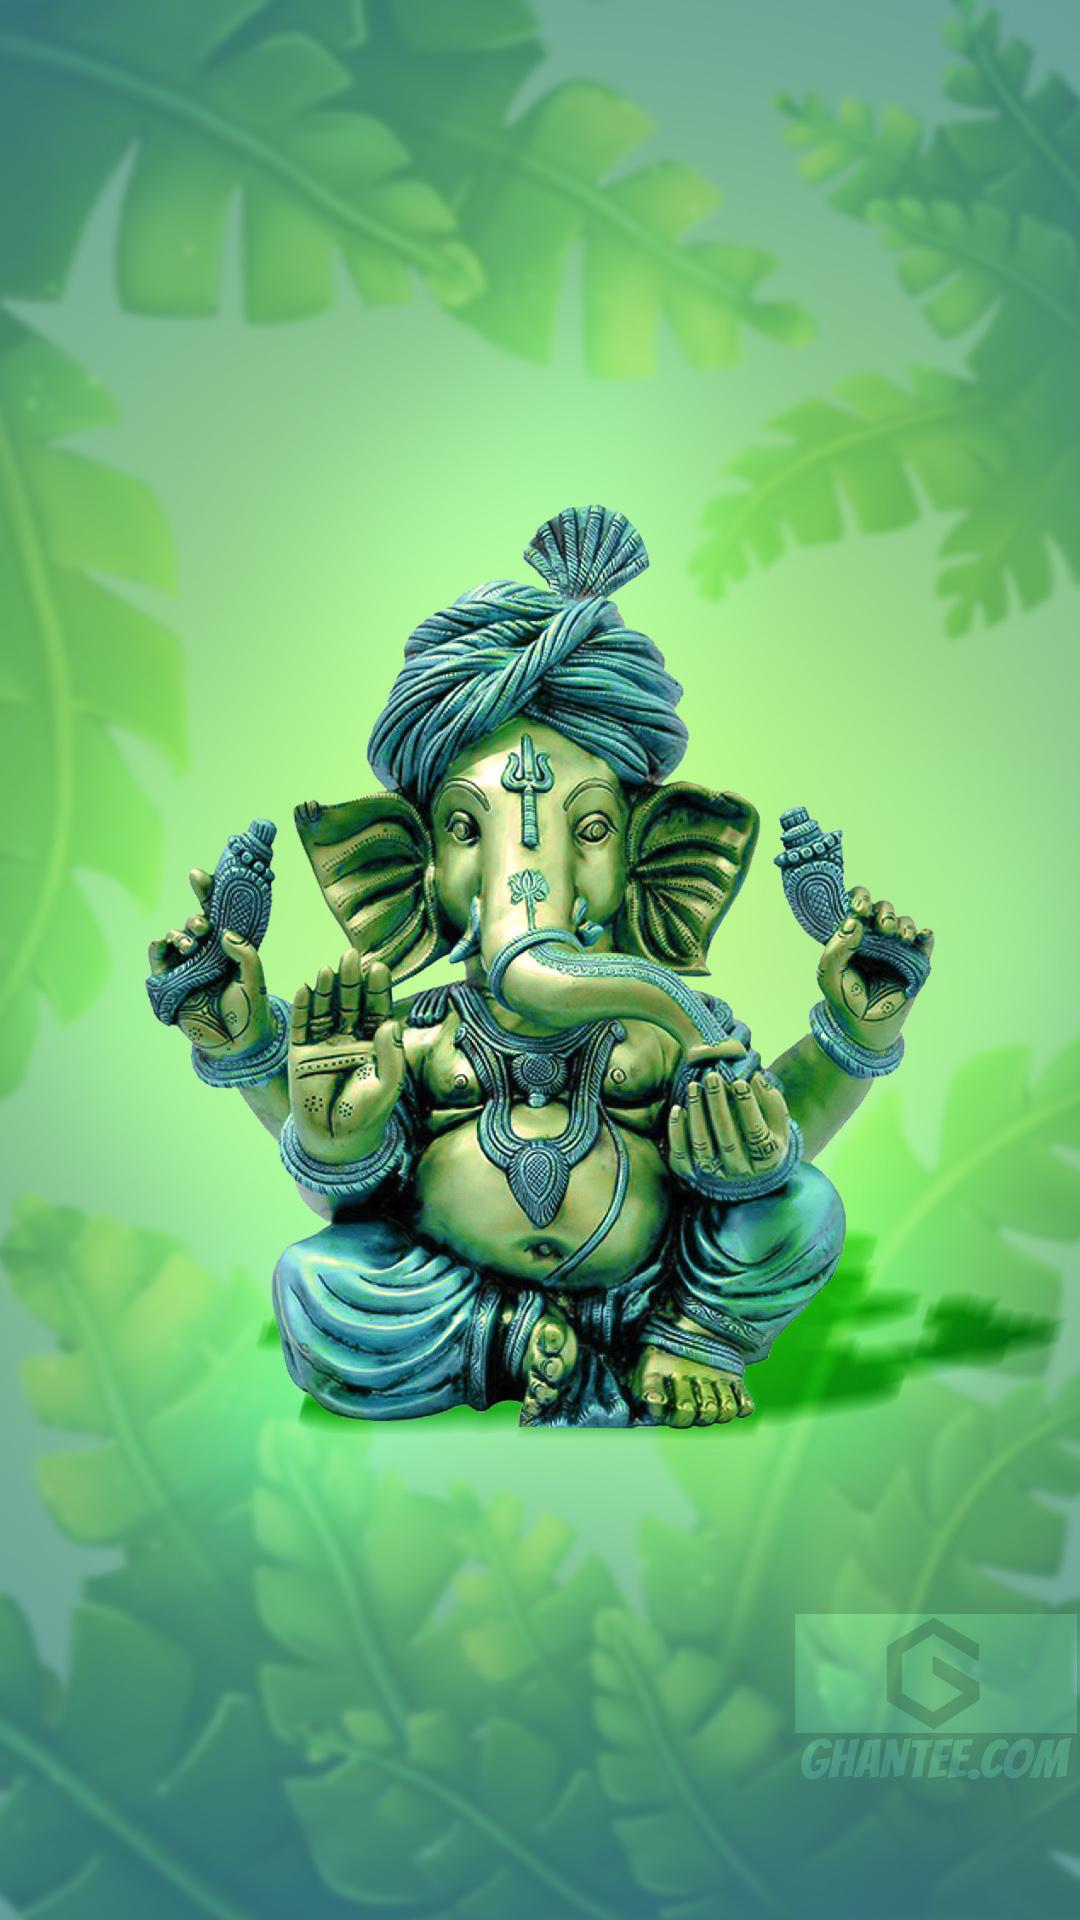 lord ganesh hd mobile wallpaper